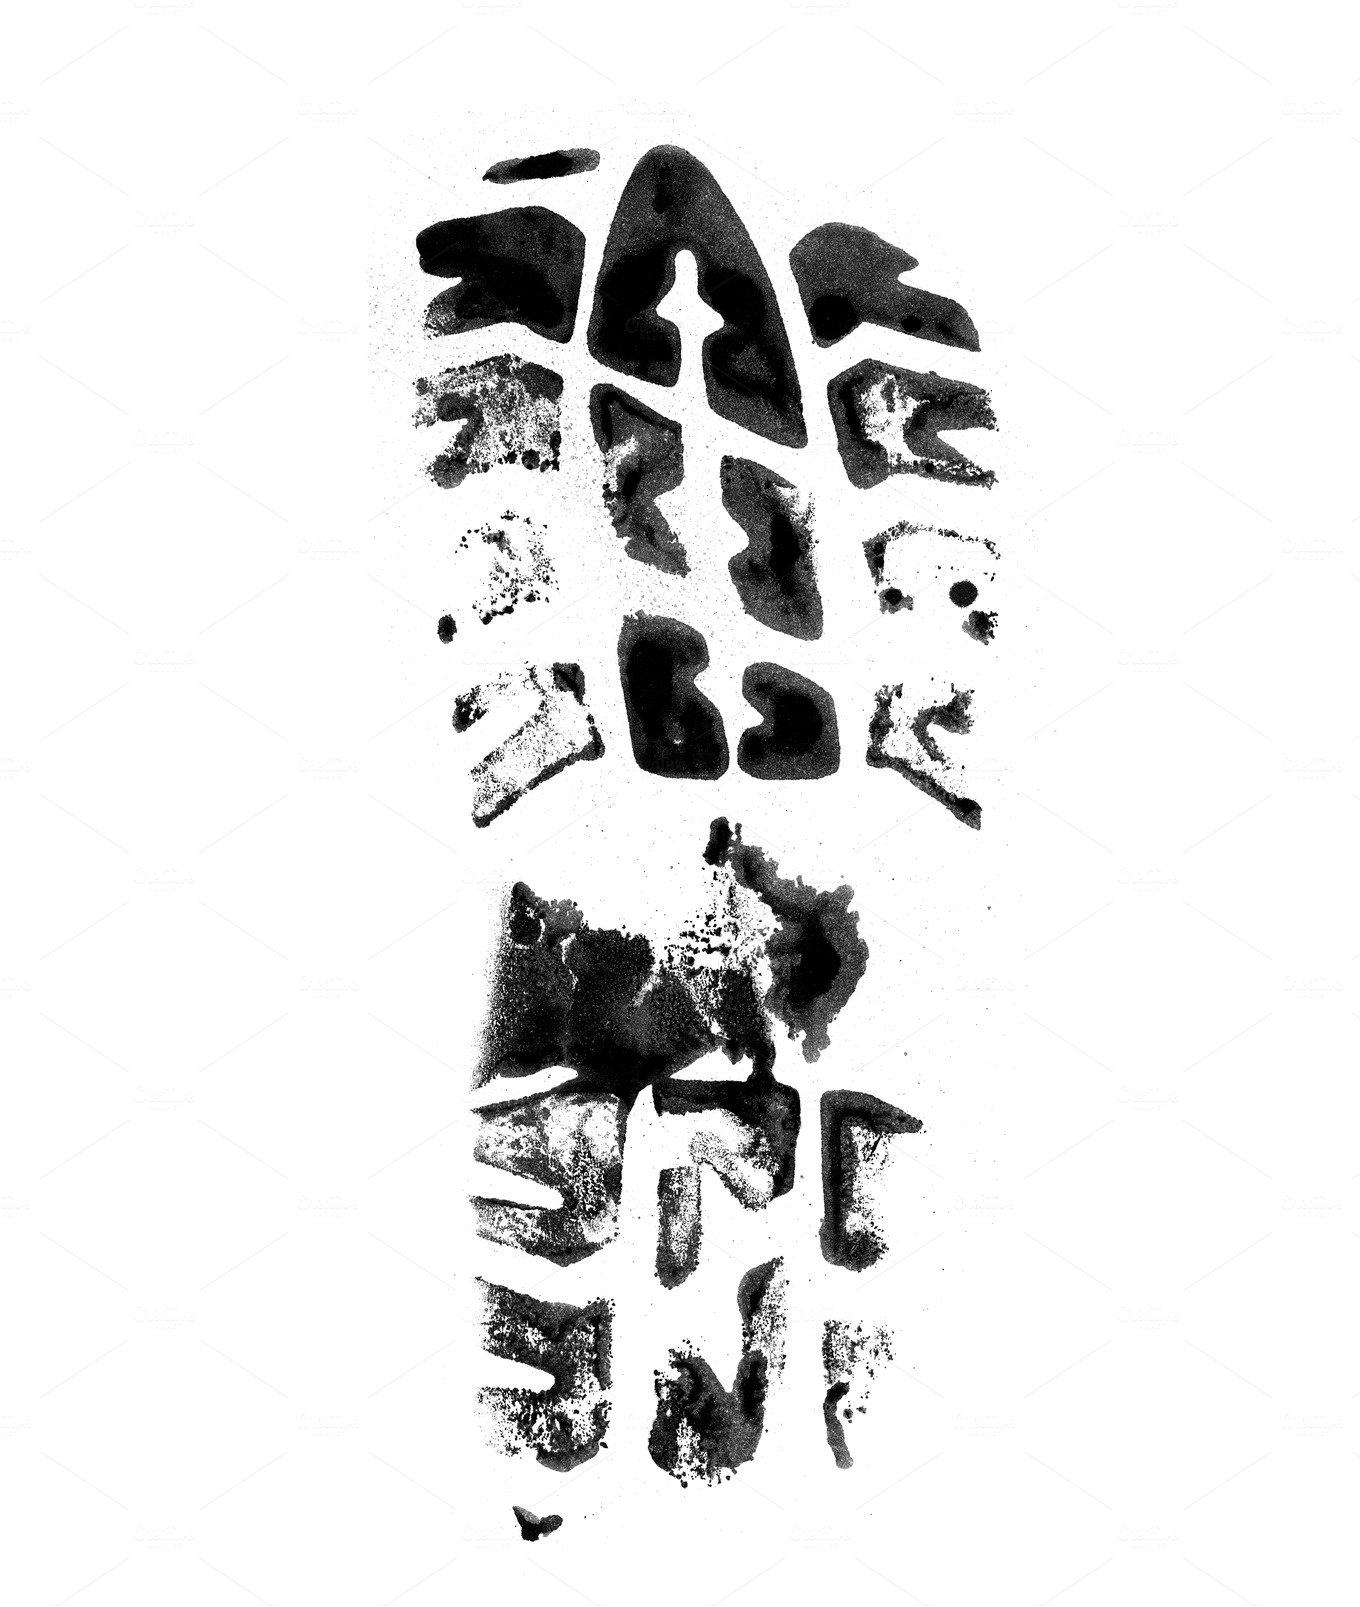 shoe print background ~ People Photos ~ Creative Market